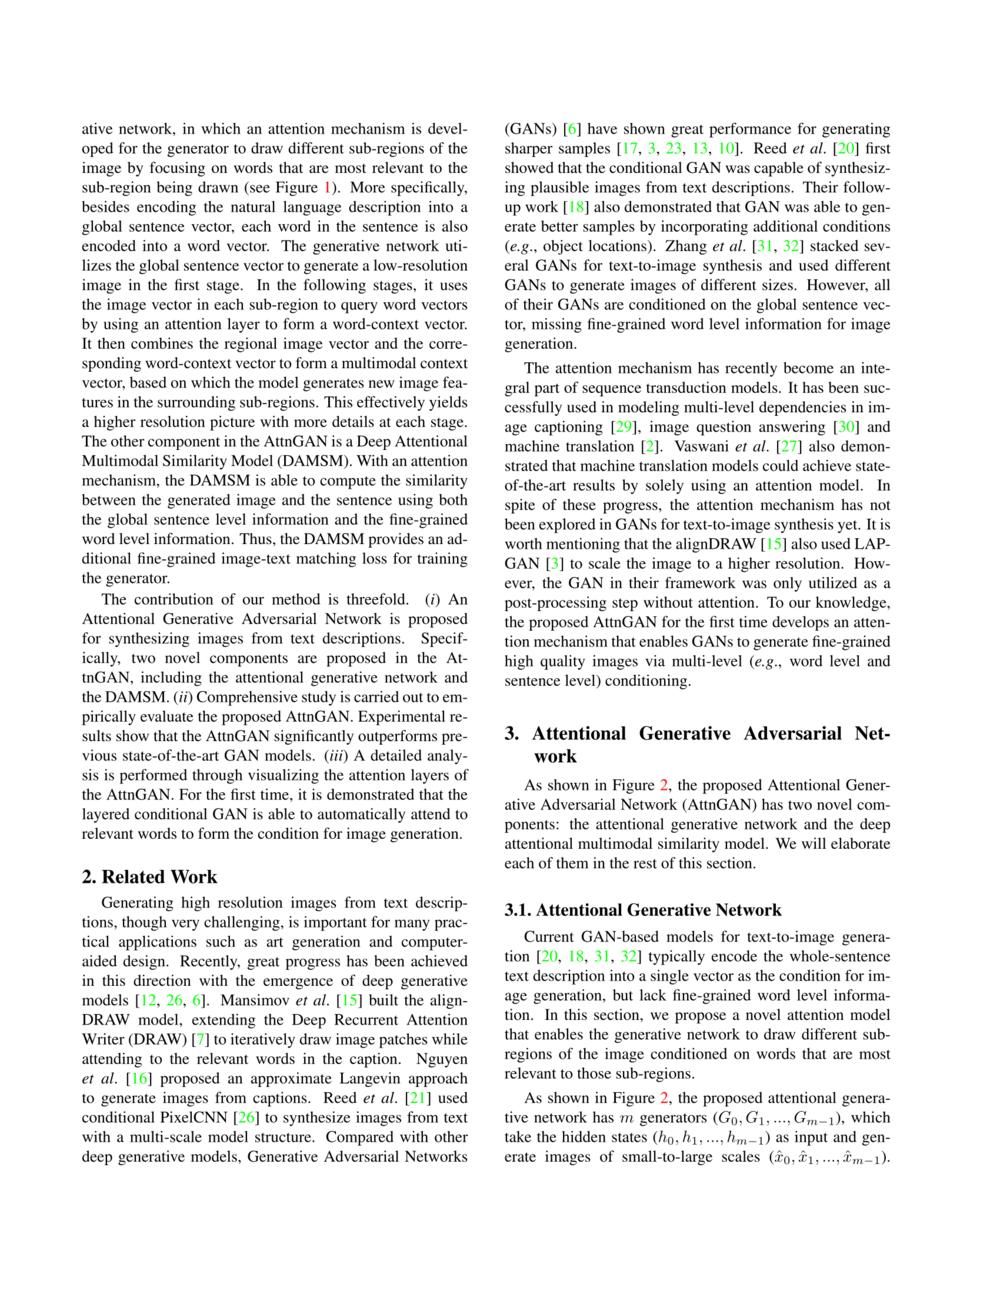 microsoft-researchers-build-a-bot-that-draws.001-2.png